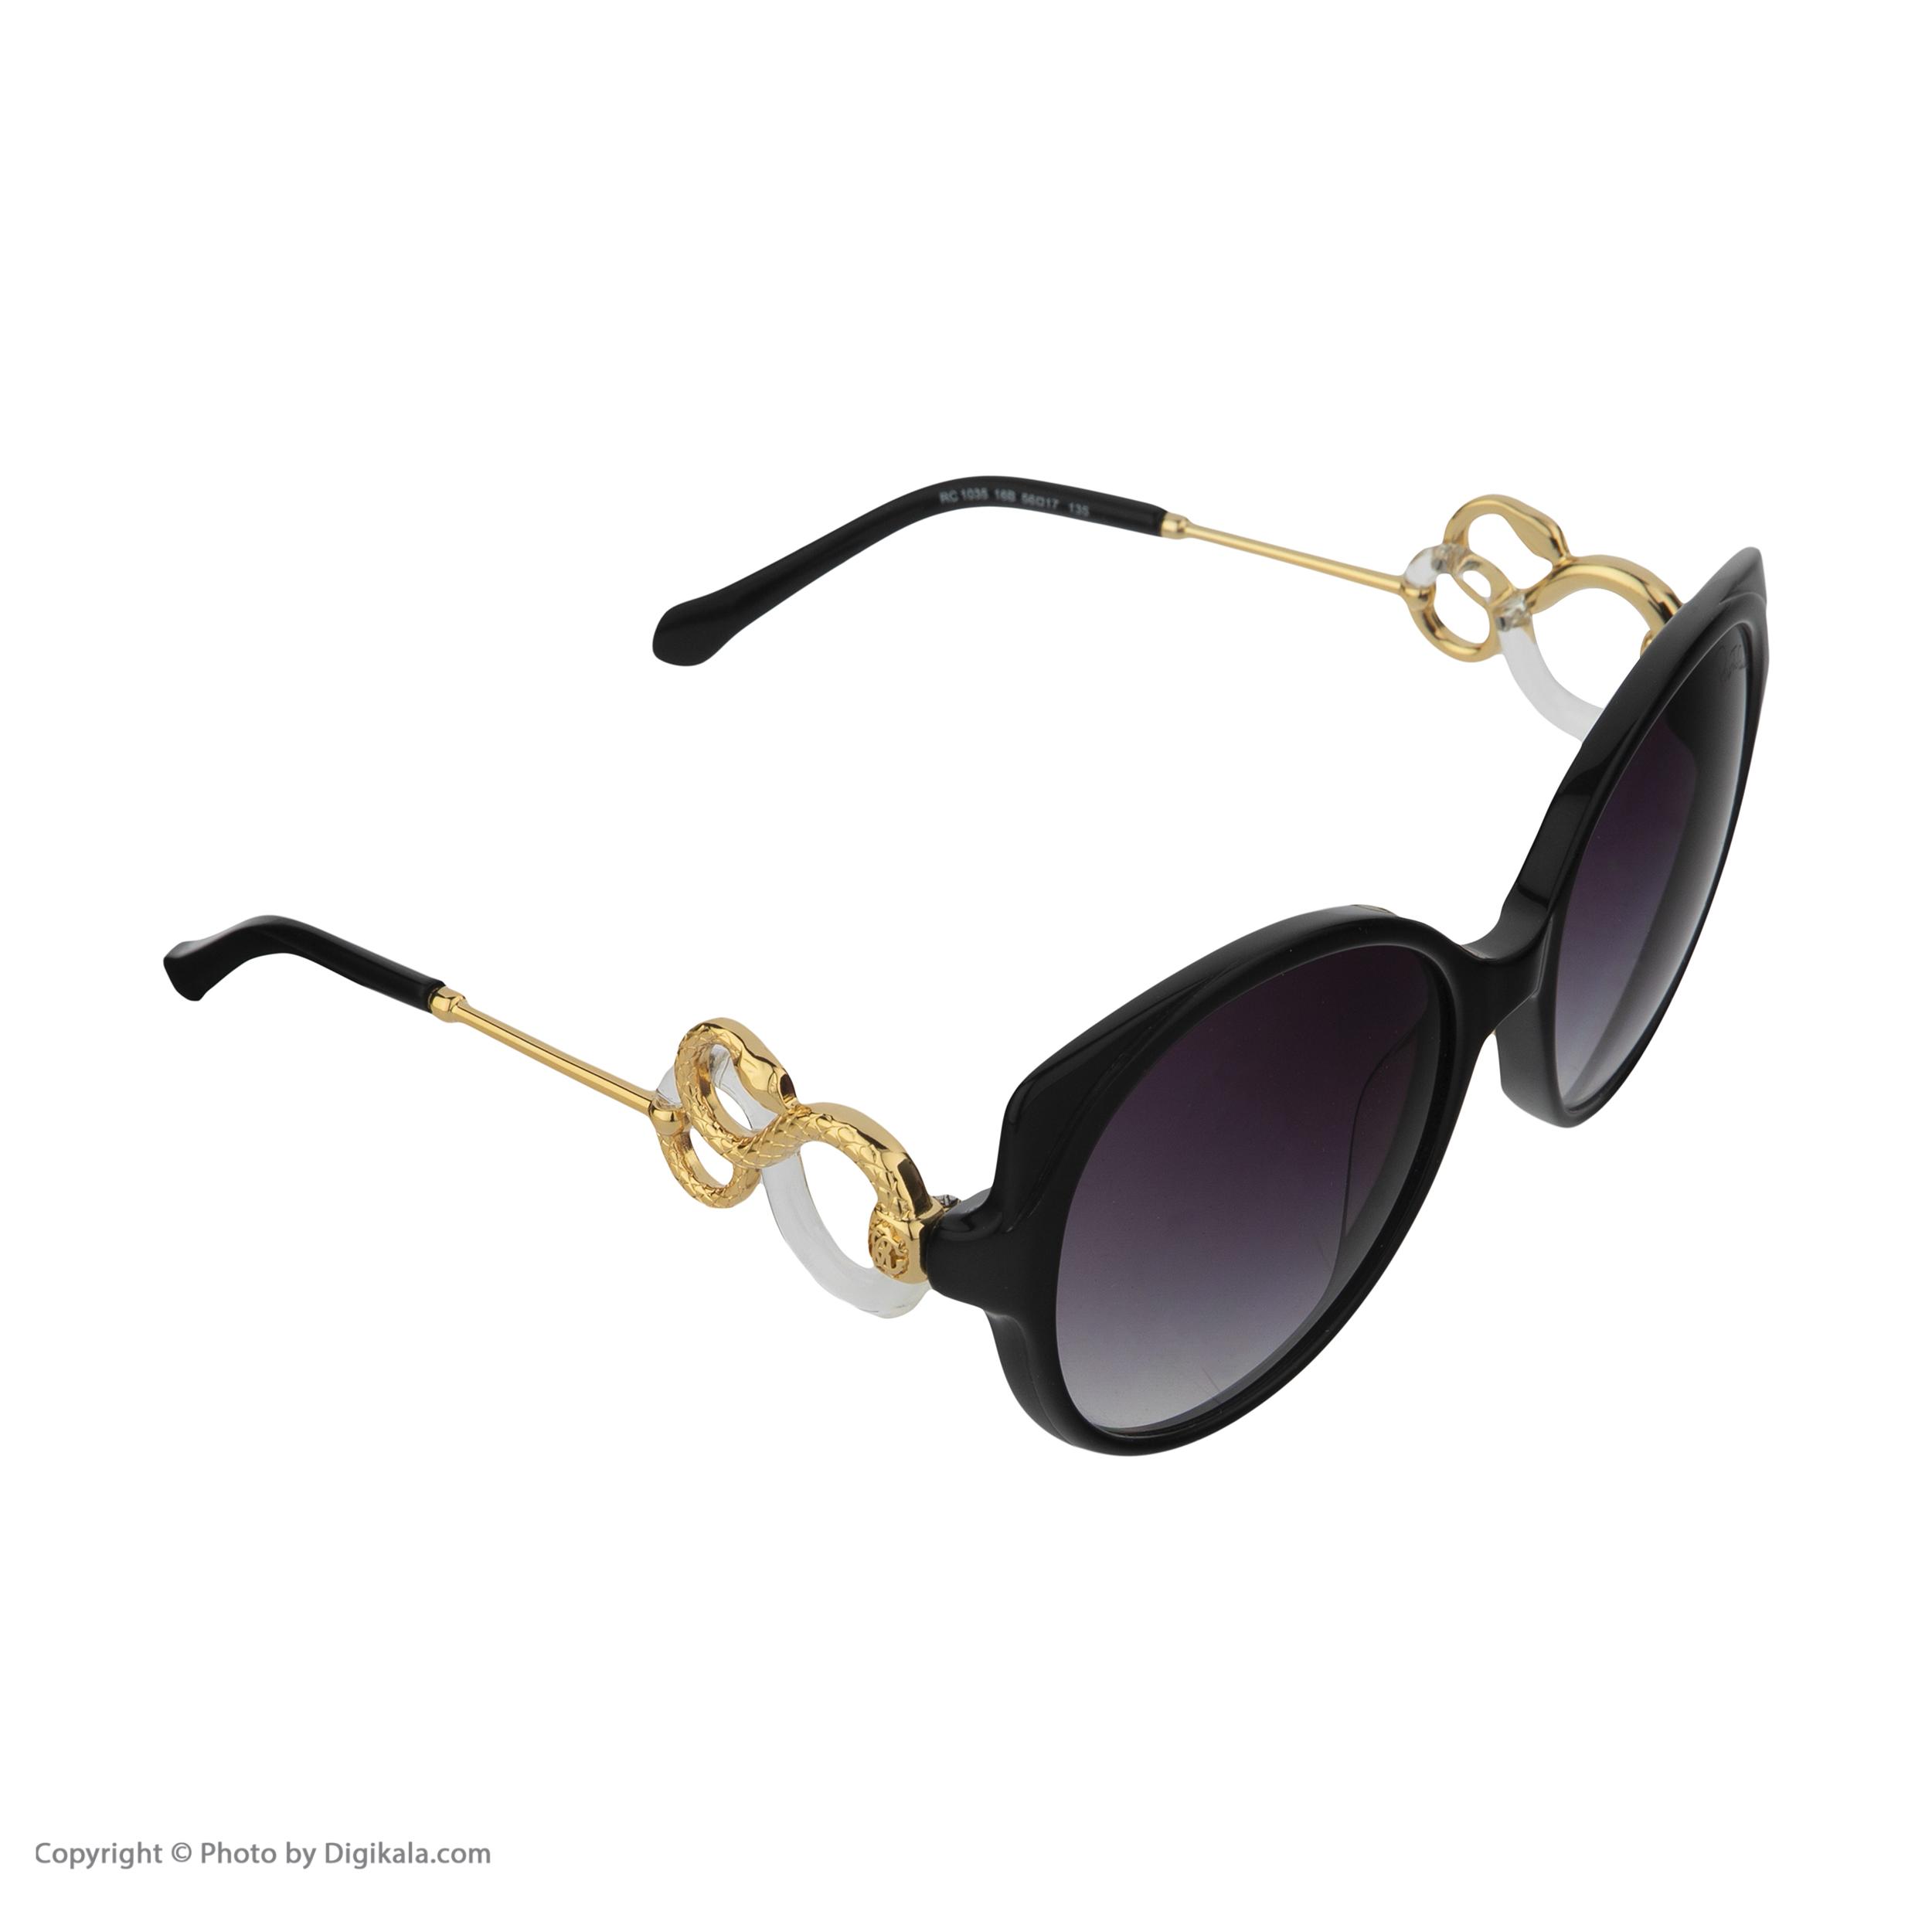 عینک آفتابی زنانه روبرتو کاوالی مدل 1035 -  - 3